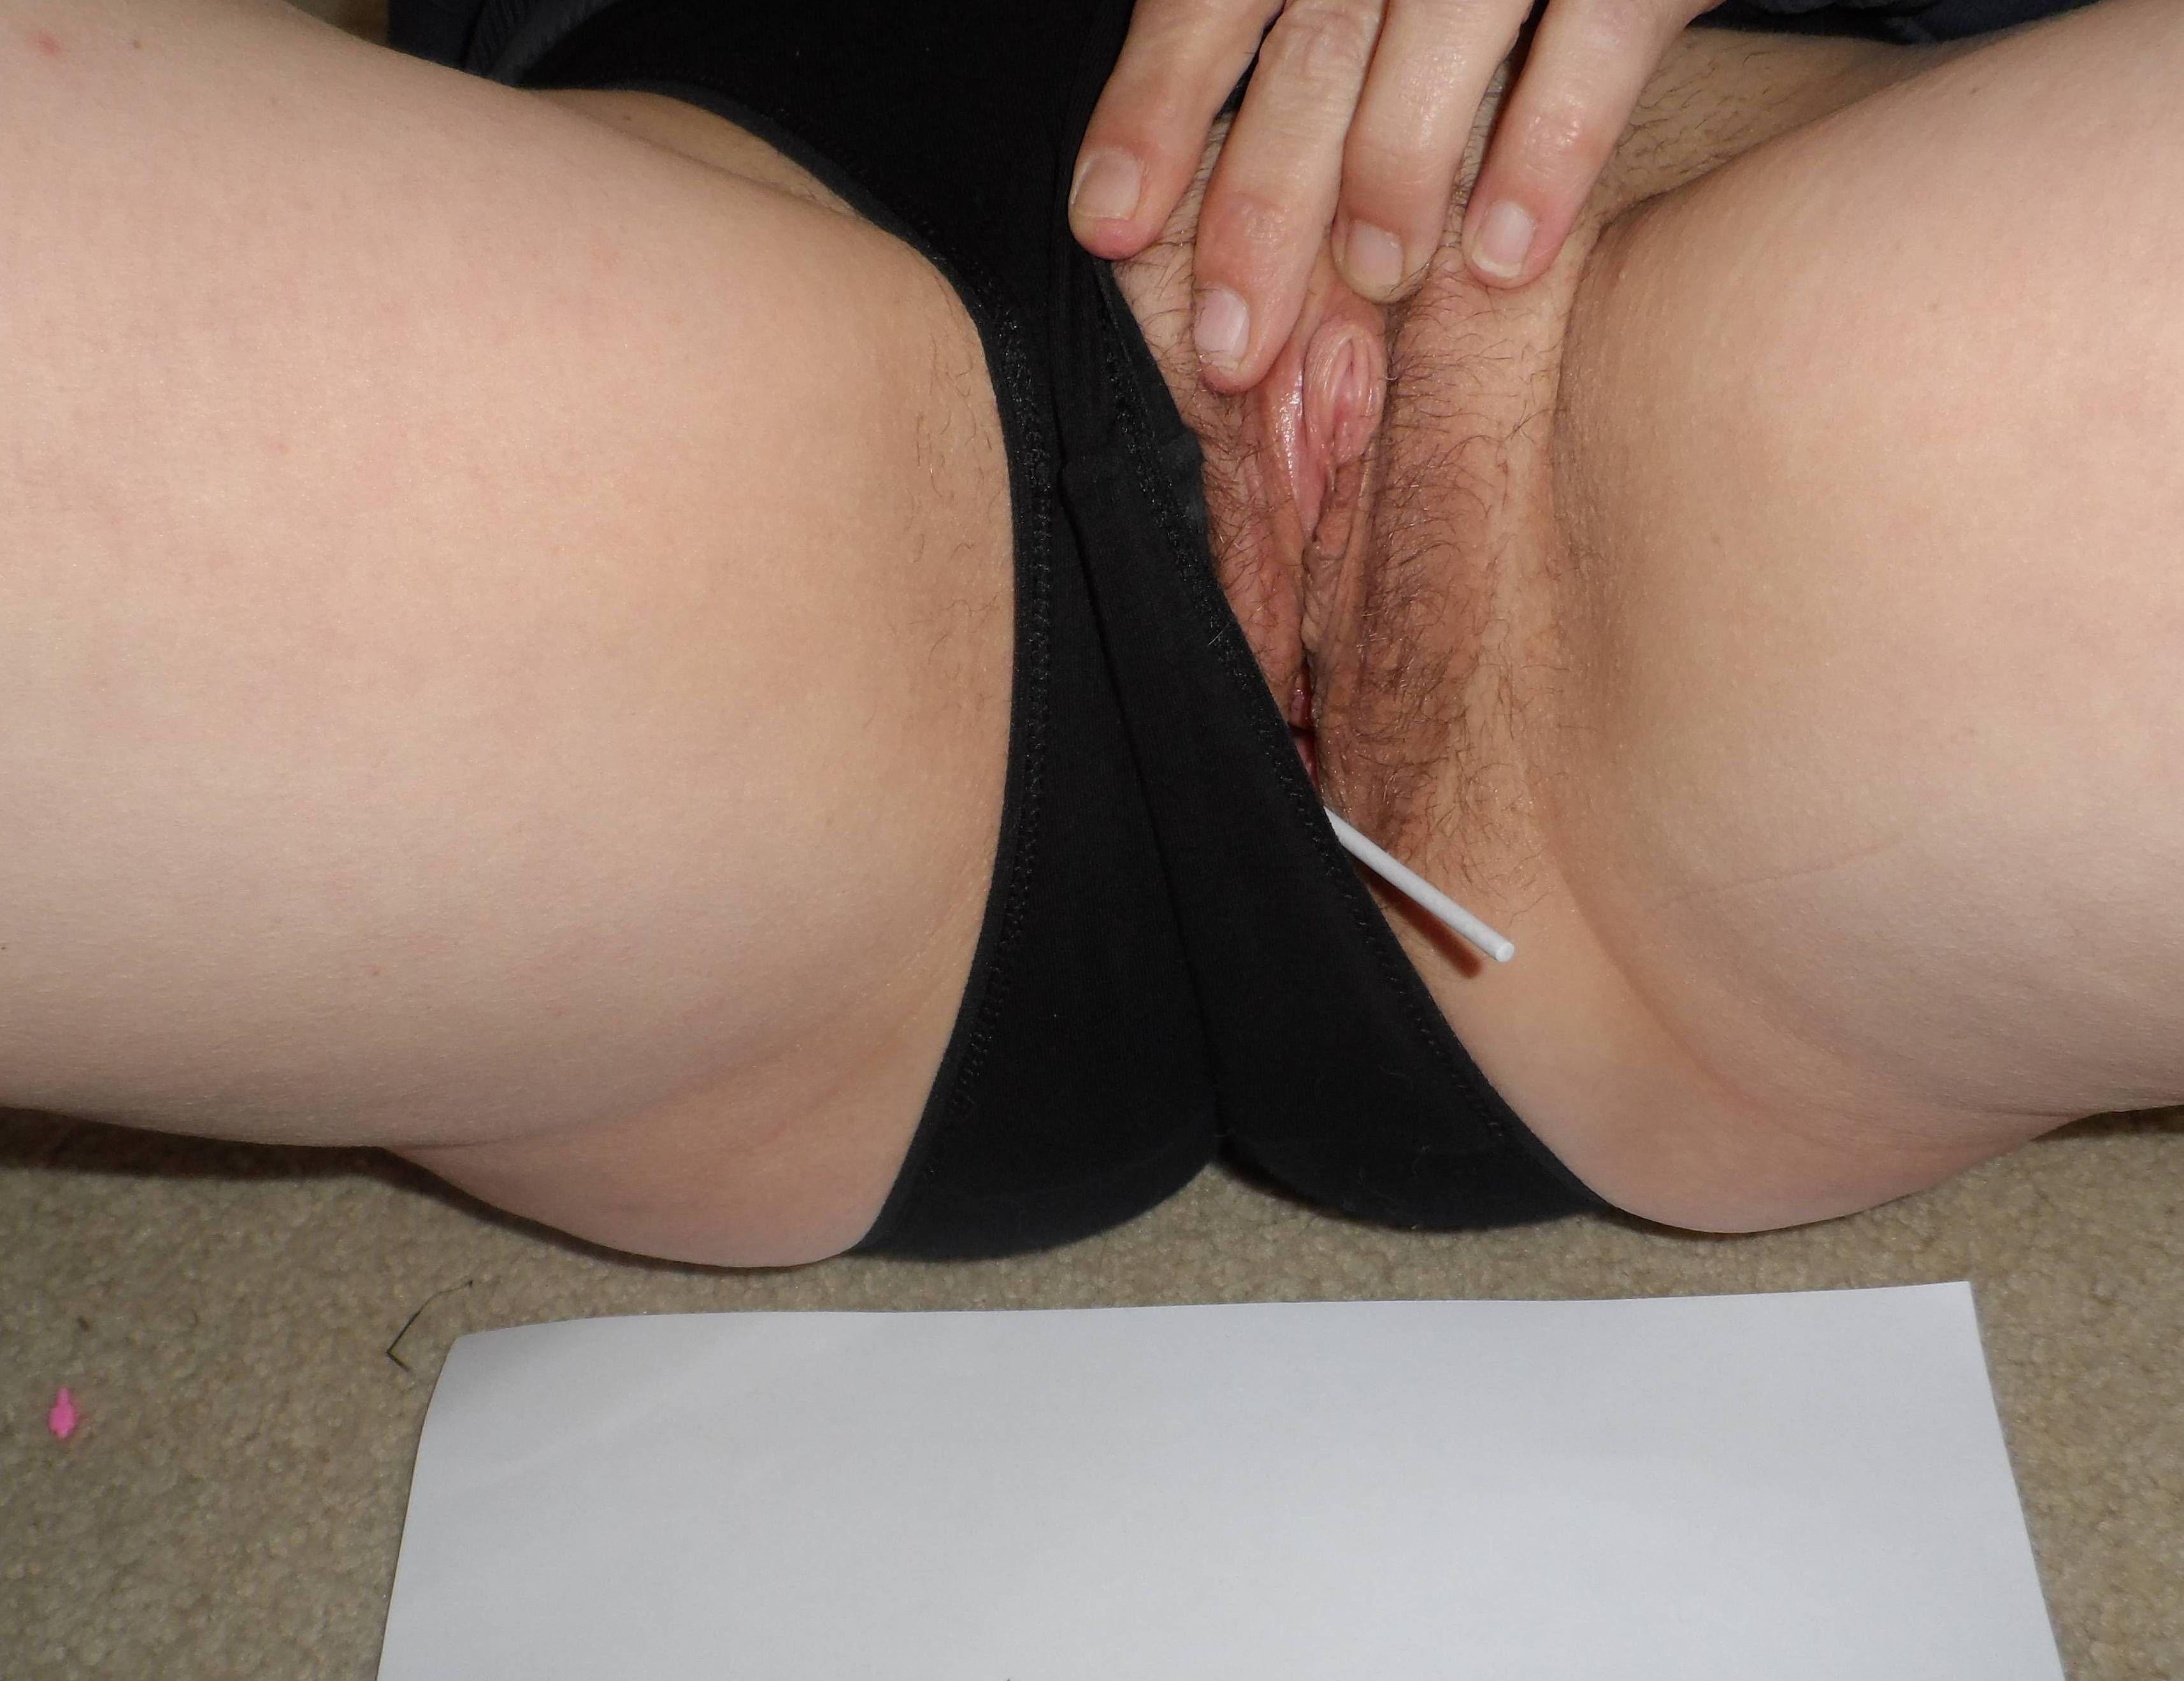 Nice Panties Cumshot Hd Porn Movies cheating wife cum soaked panties - porn clips.